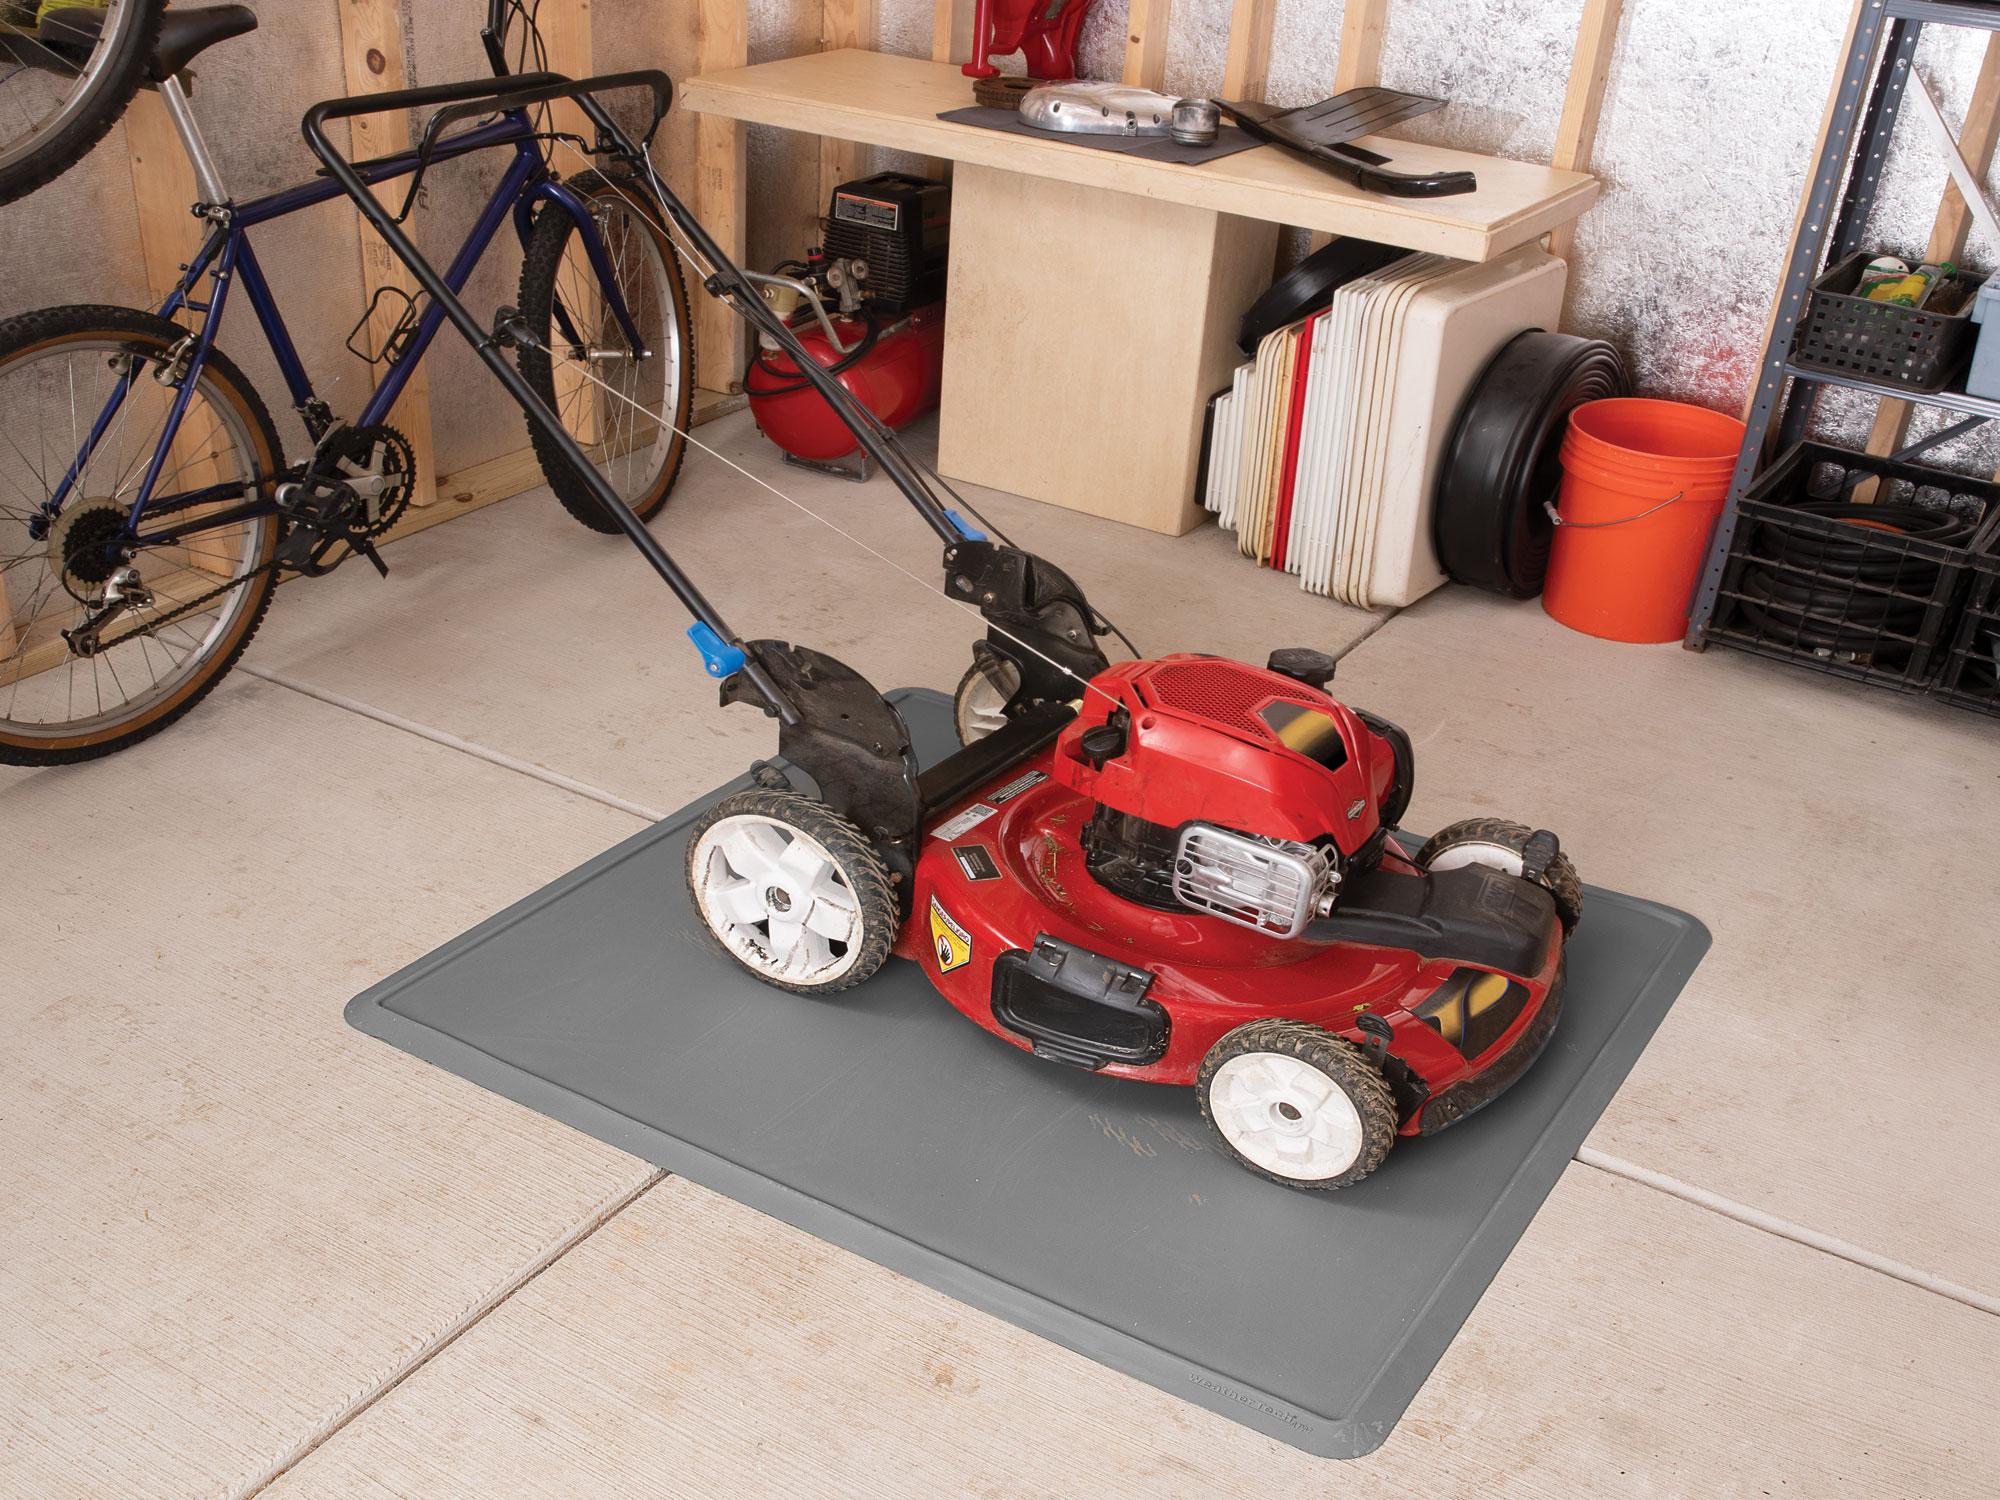 Lawnmower on an All Purpose Mat.